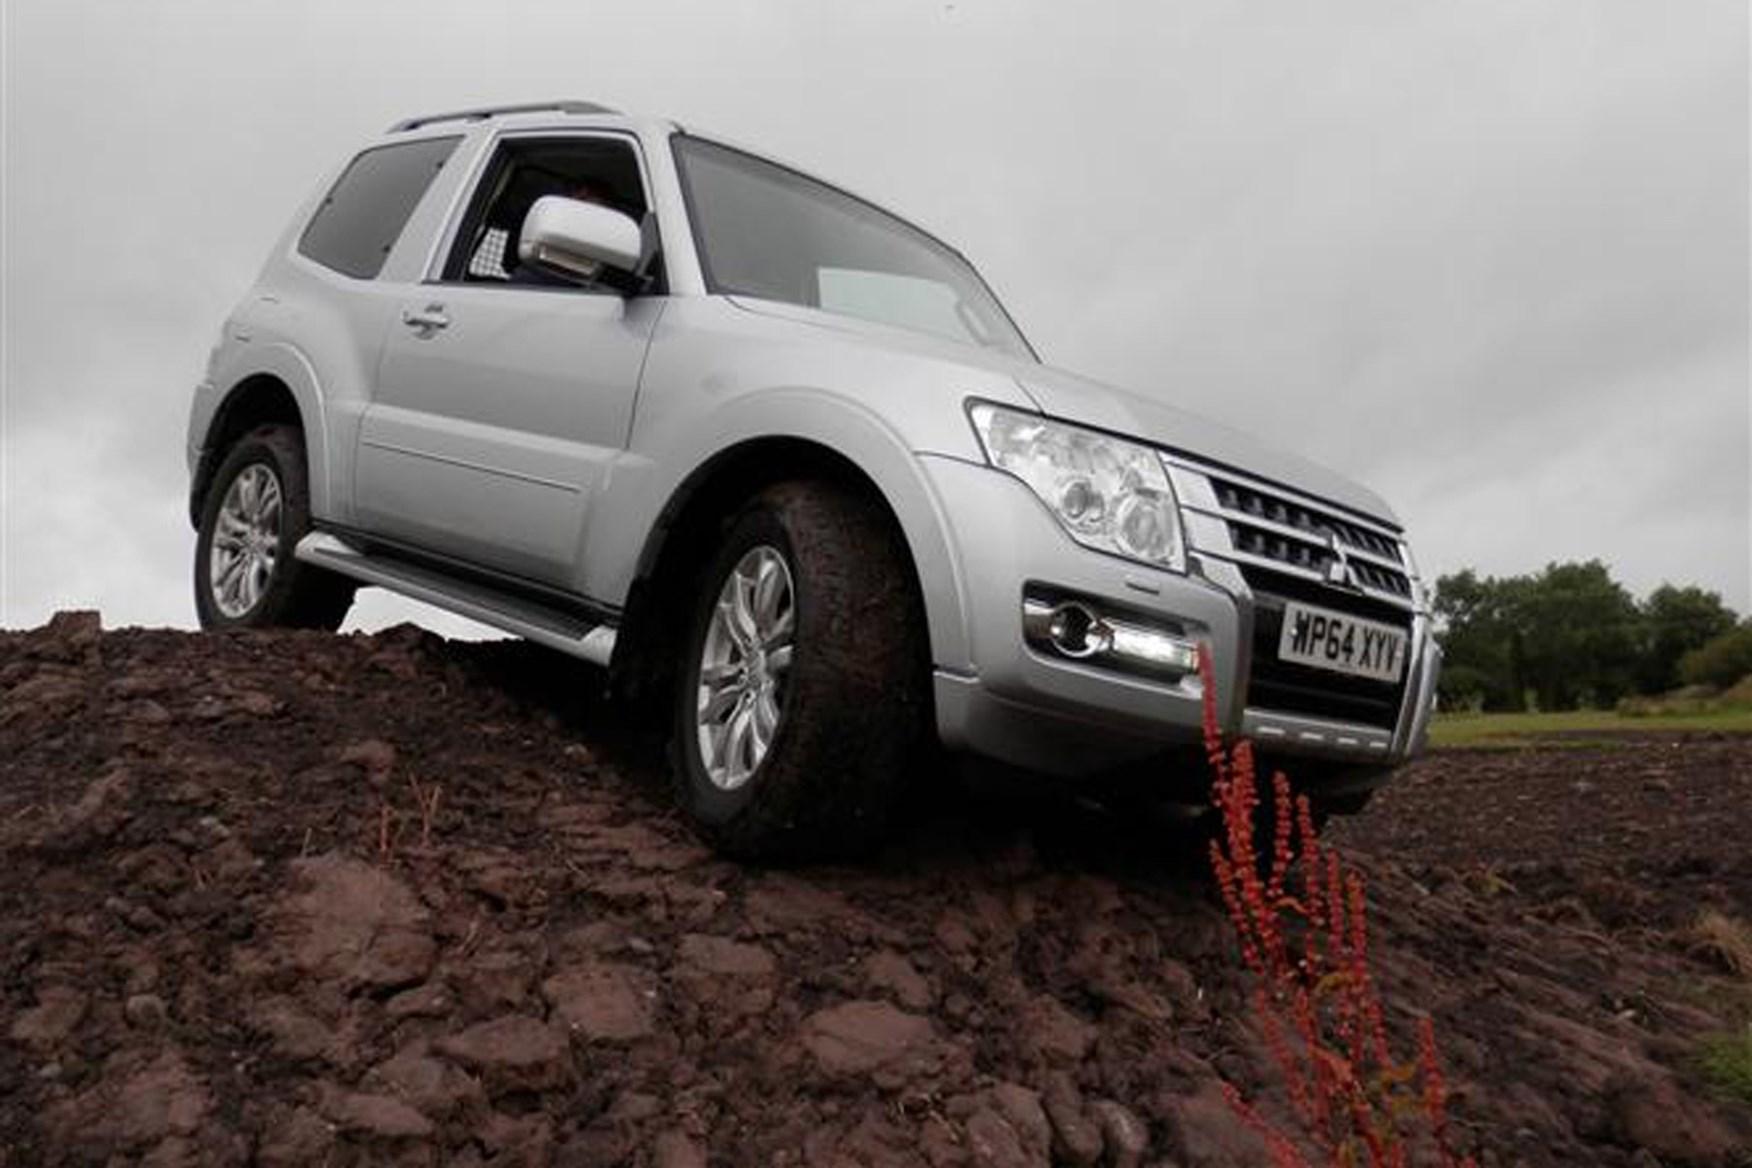 Mitsubishi Shogun review on Parkers Vans - off road capabilities